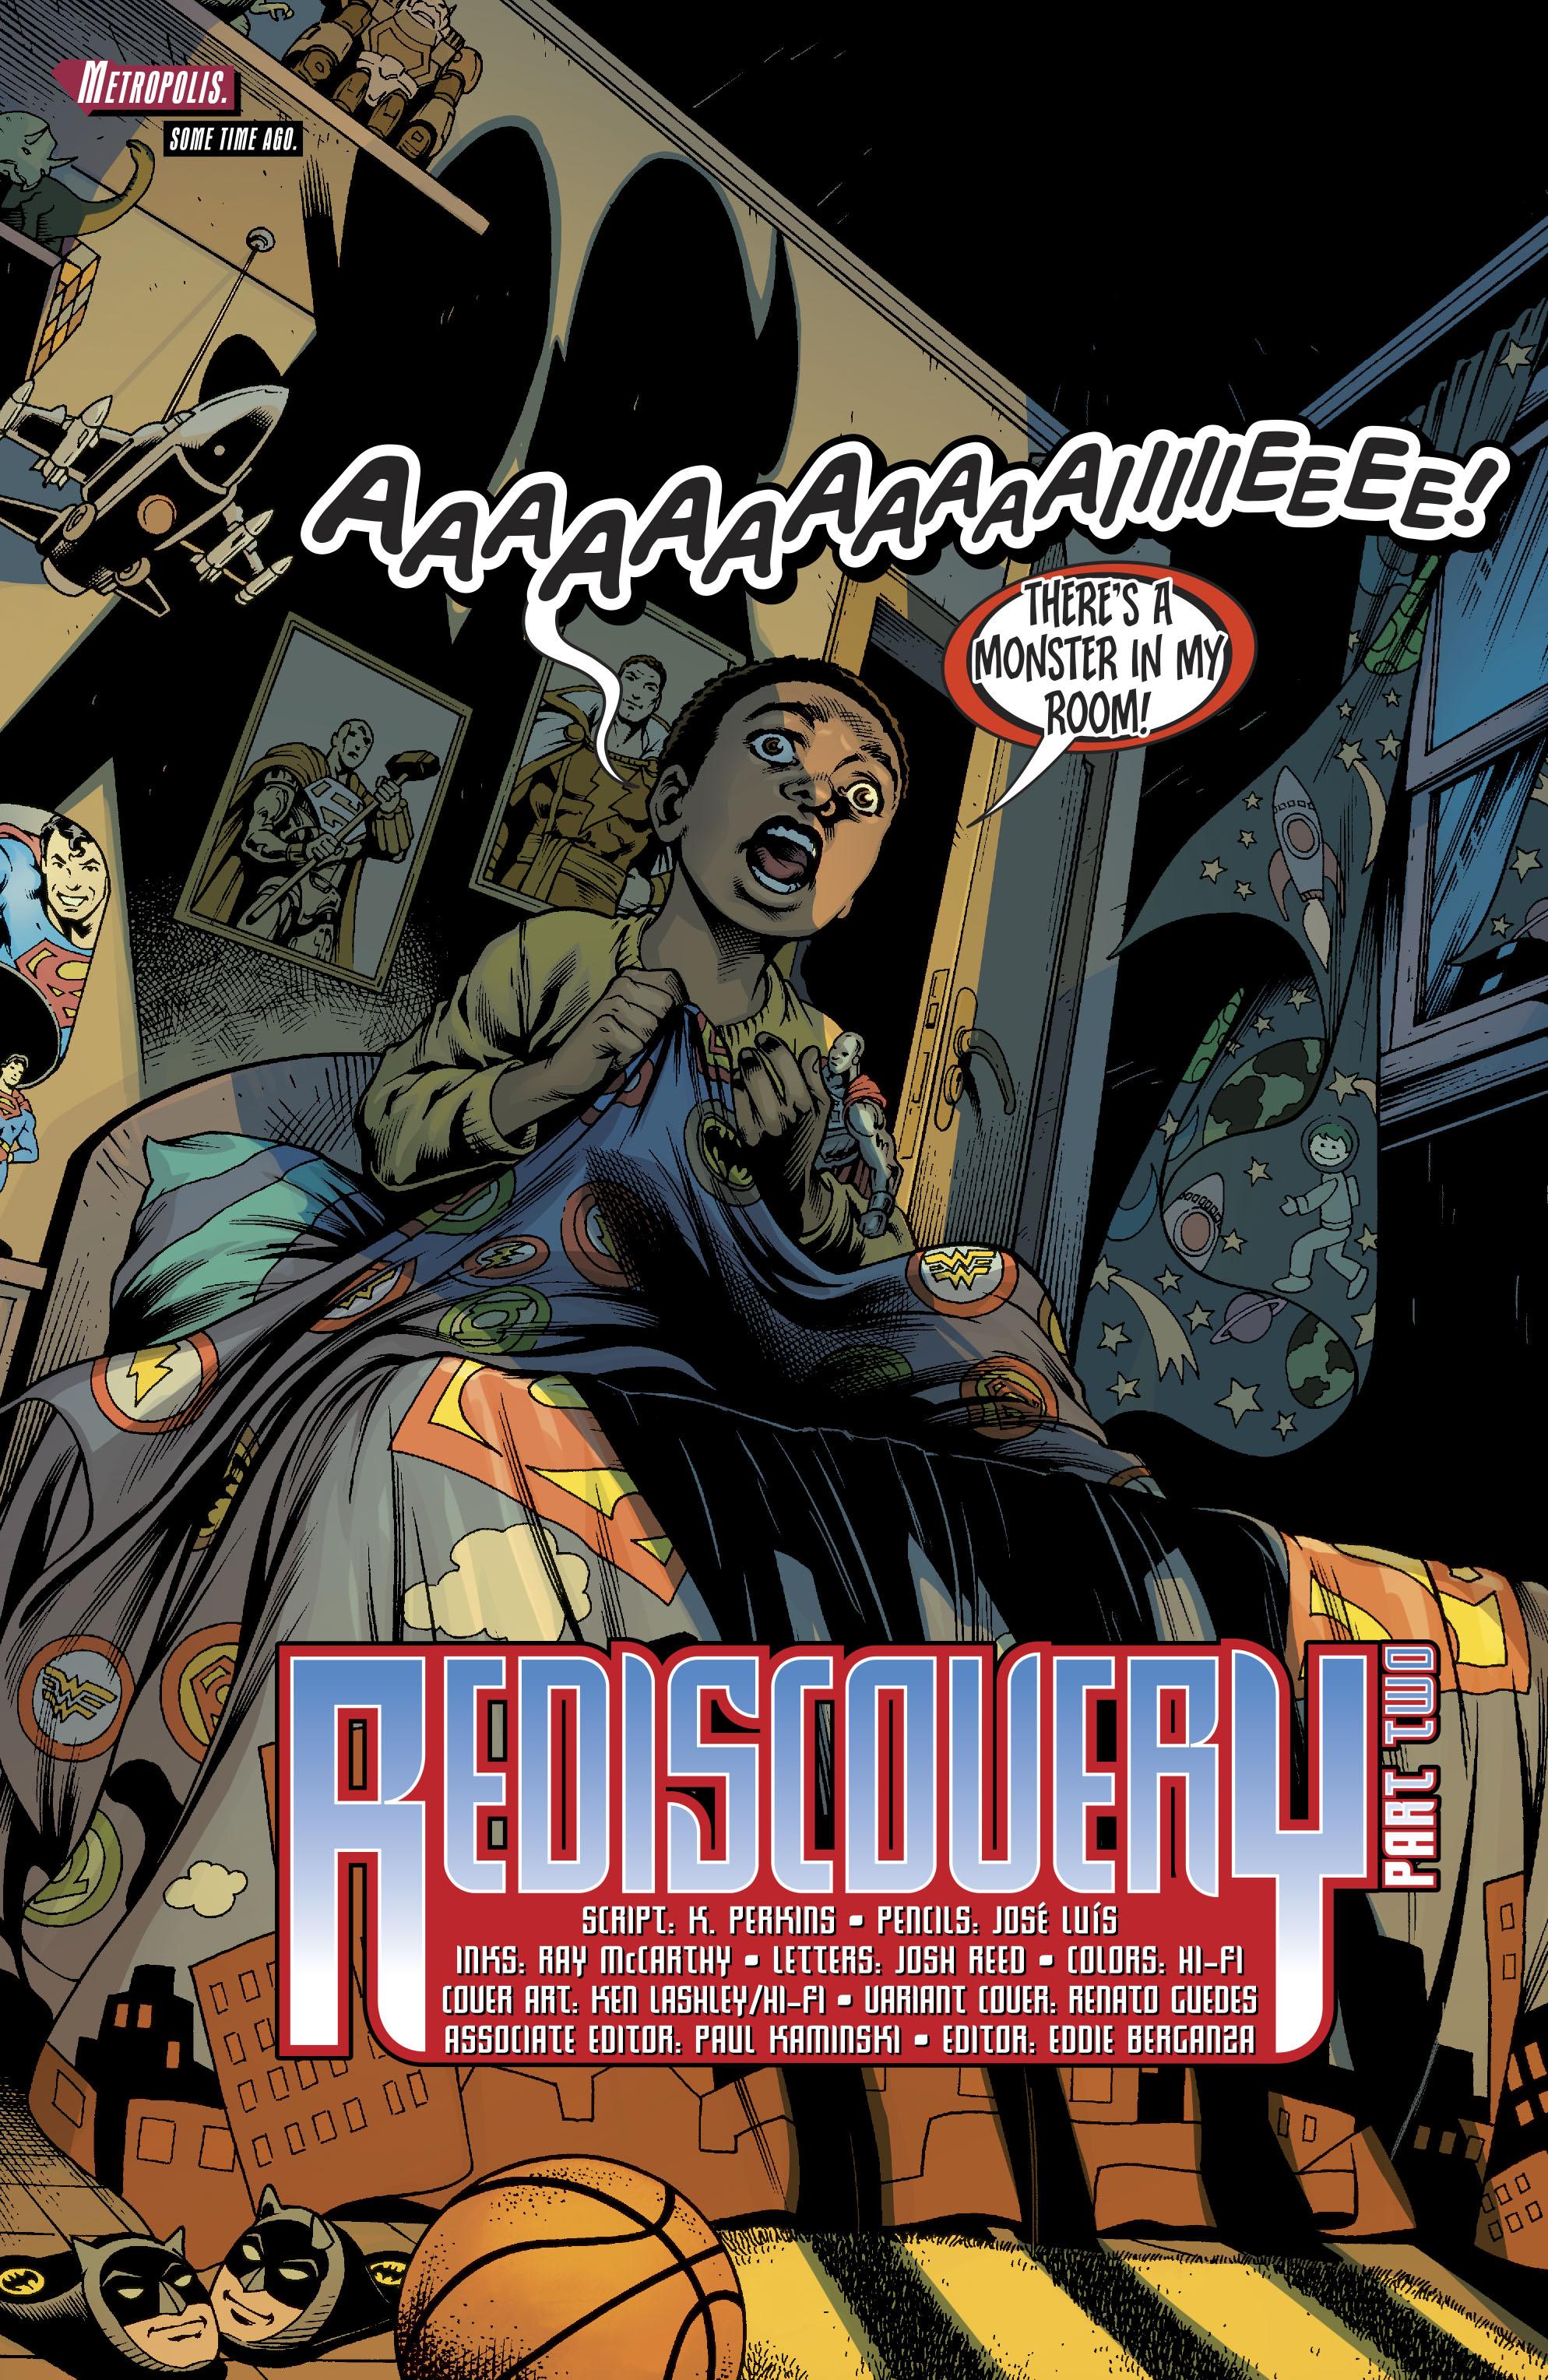 Read online Superwoman comic -  Issue #11 - 4